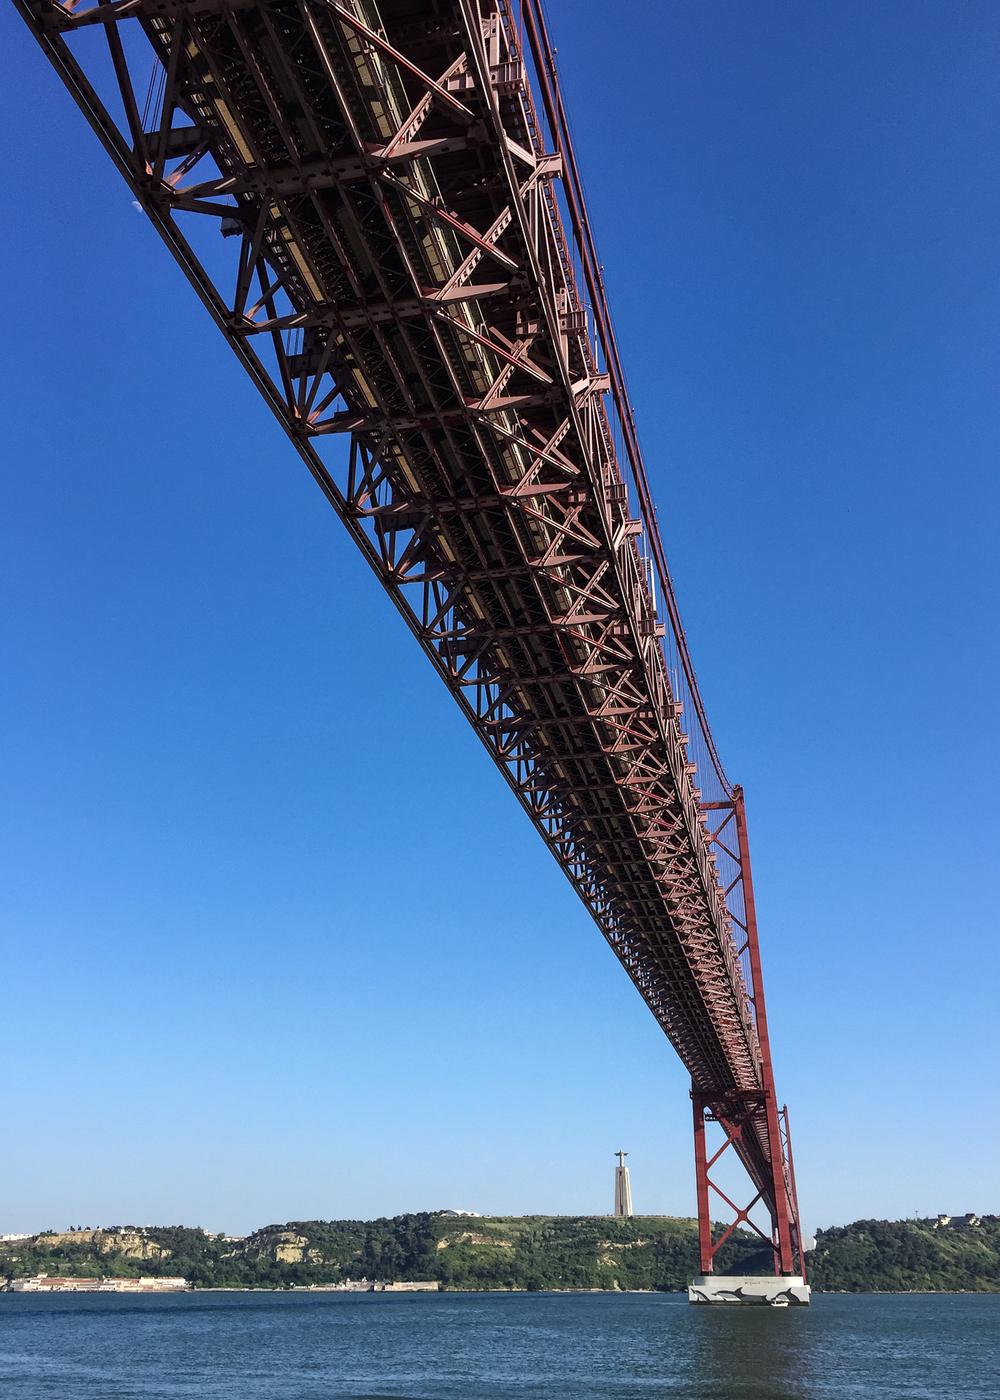 Ponte 25 de Abril from below, with theSantuario Nacional de Cristo Rei